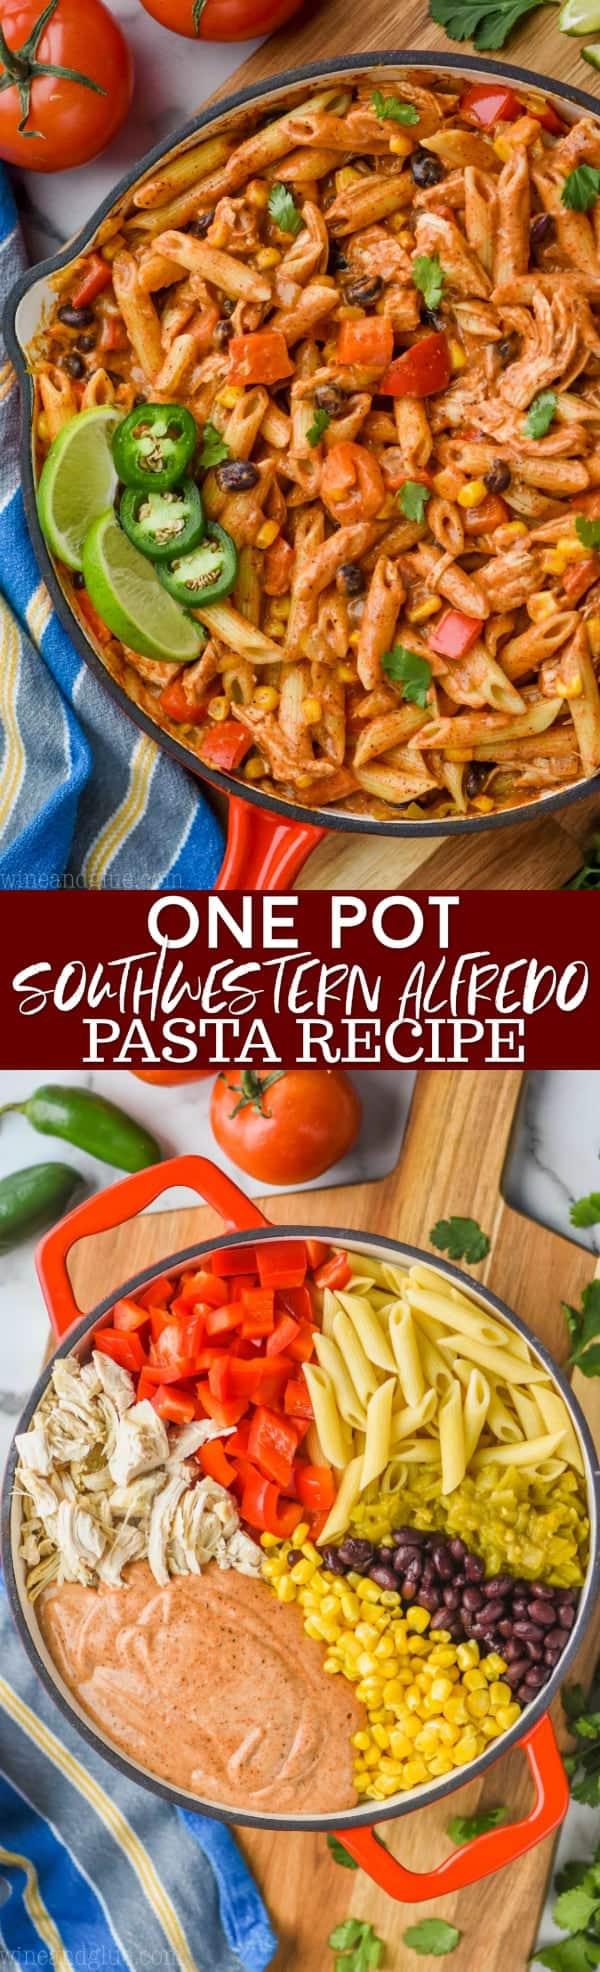 collage of one pot southwestern alfredo pasta recipe